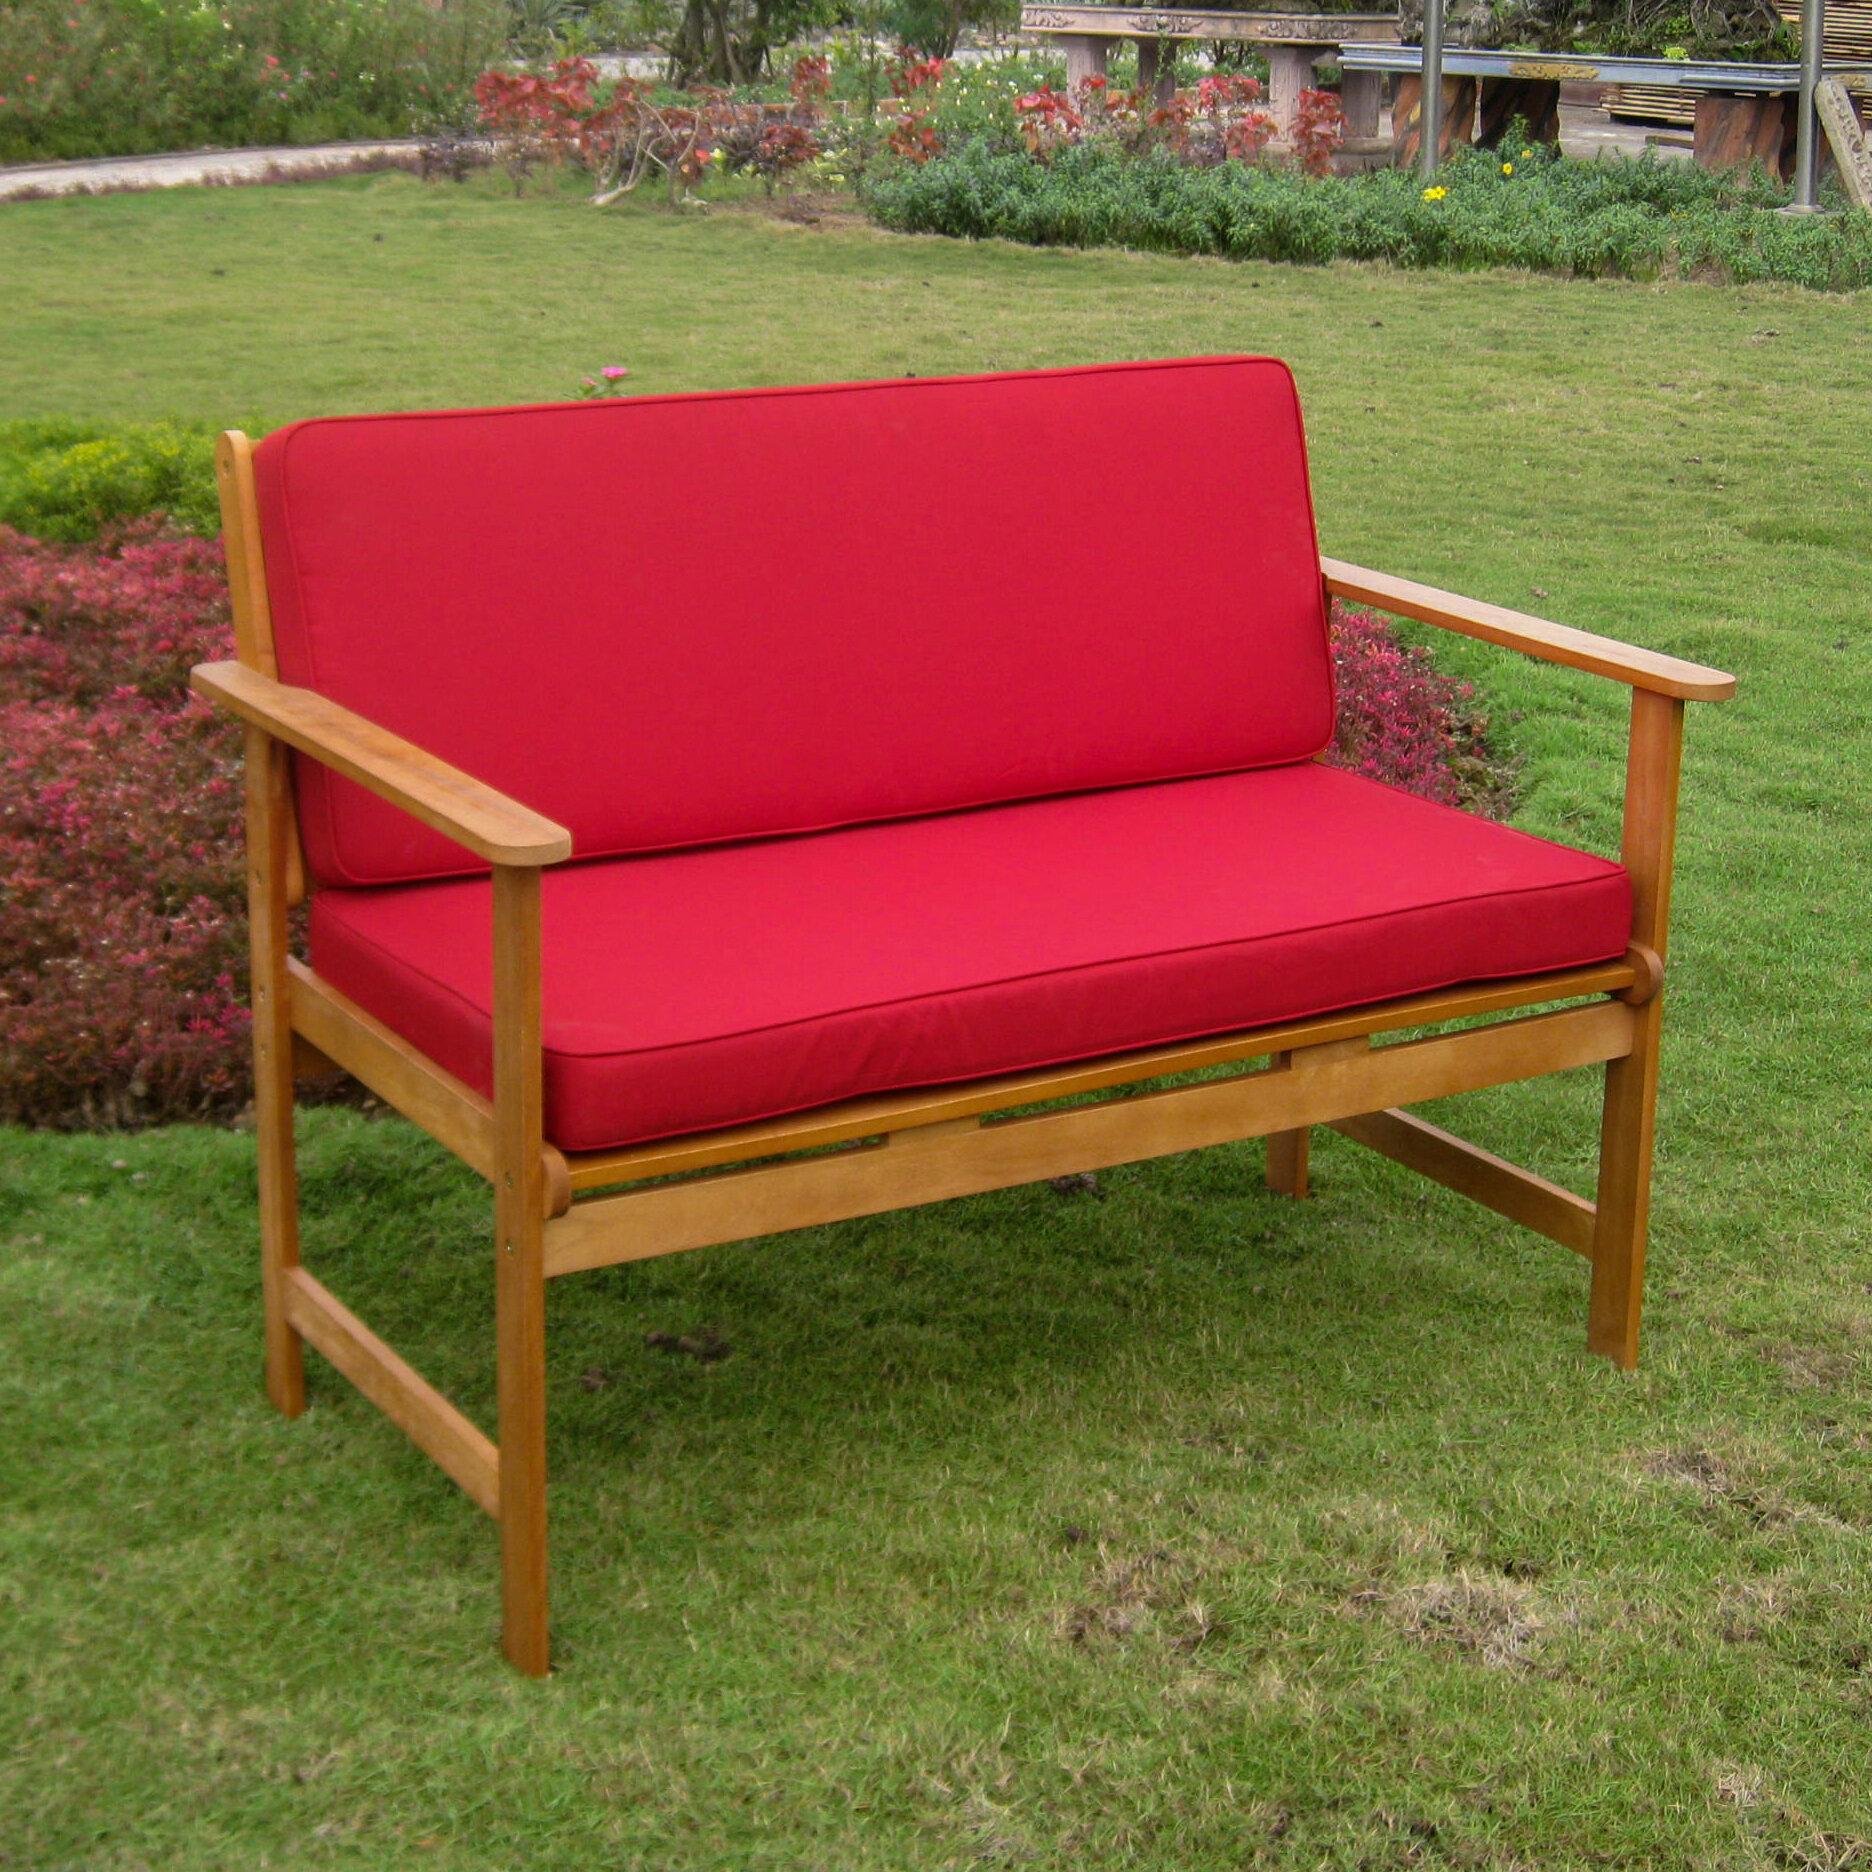 Sabbattus Wooden Garden Bench With Regard To Avoca Wood Garden Benches (View 14 of 25)